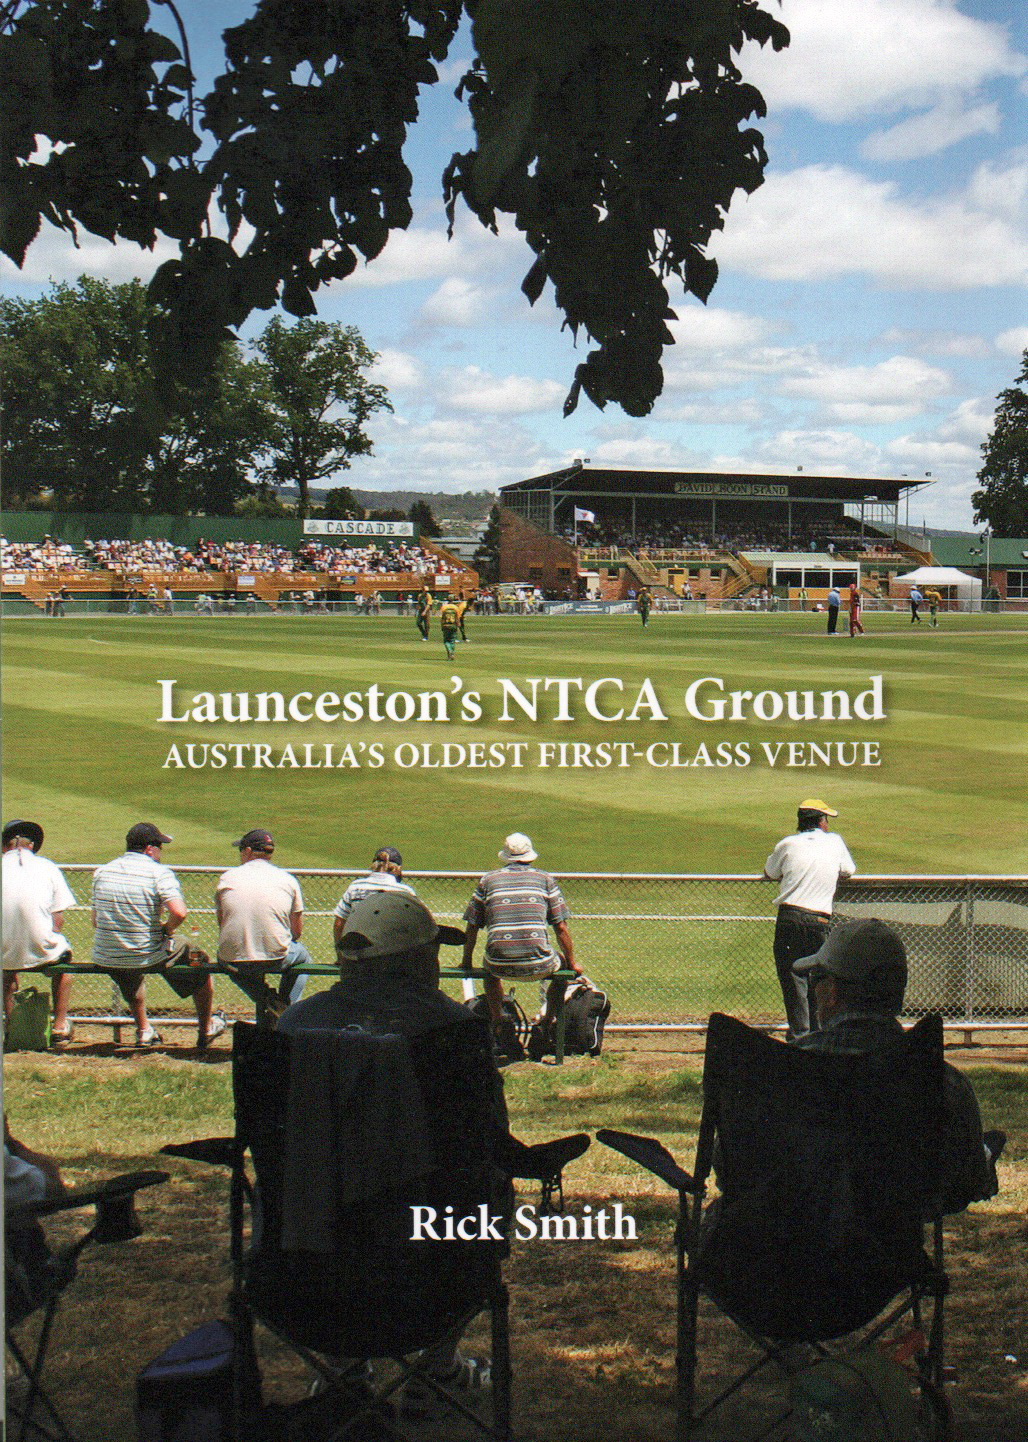 Launceston's NTCA Ground